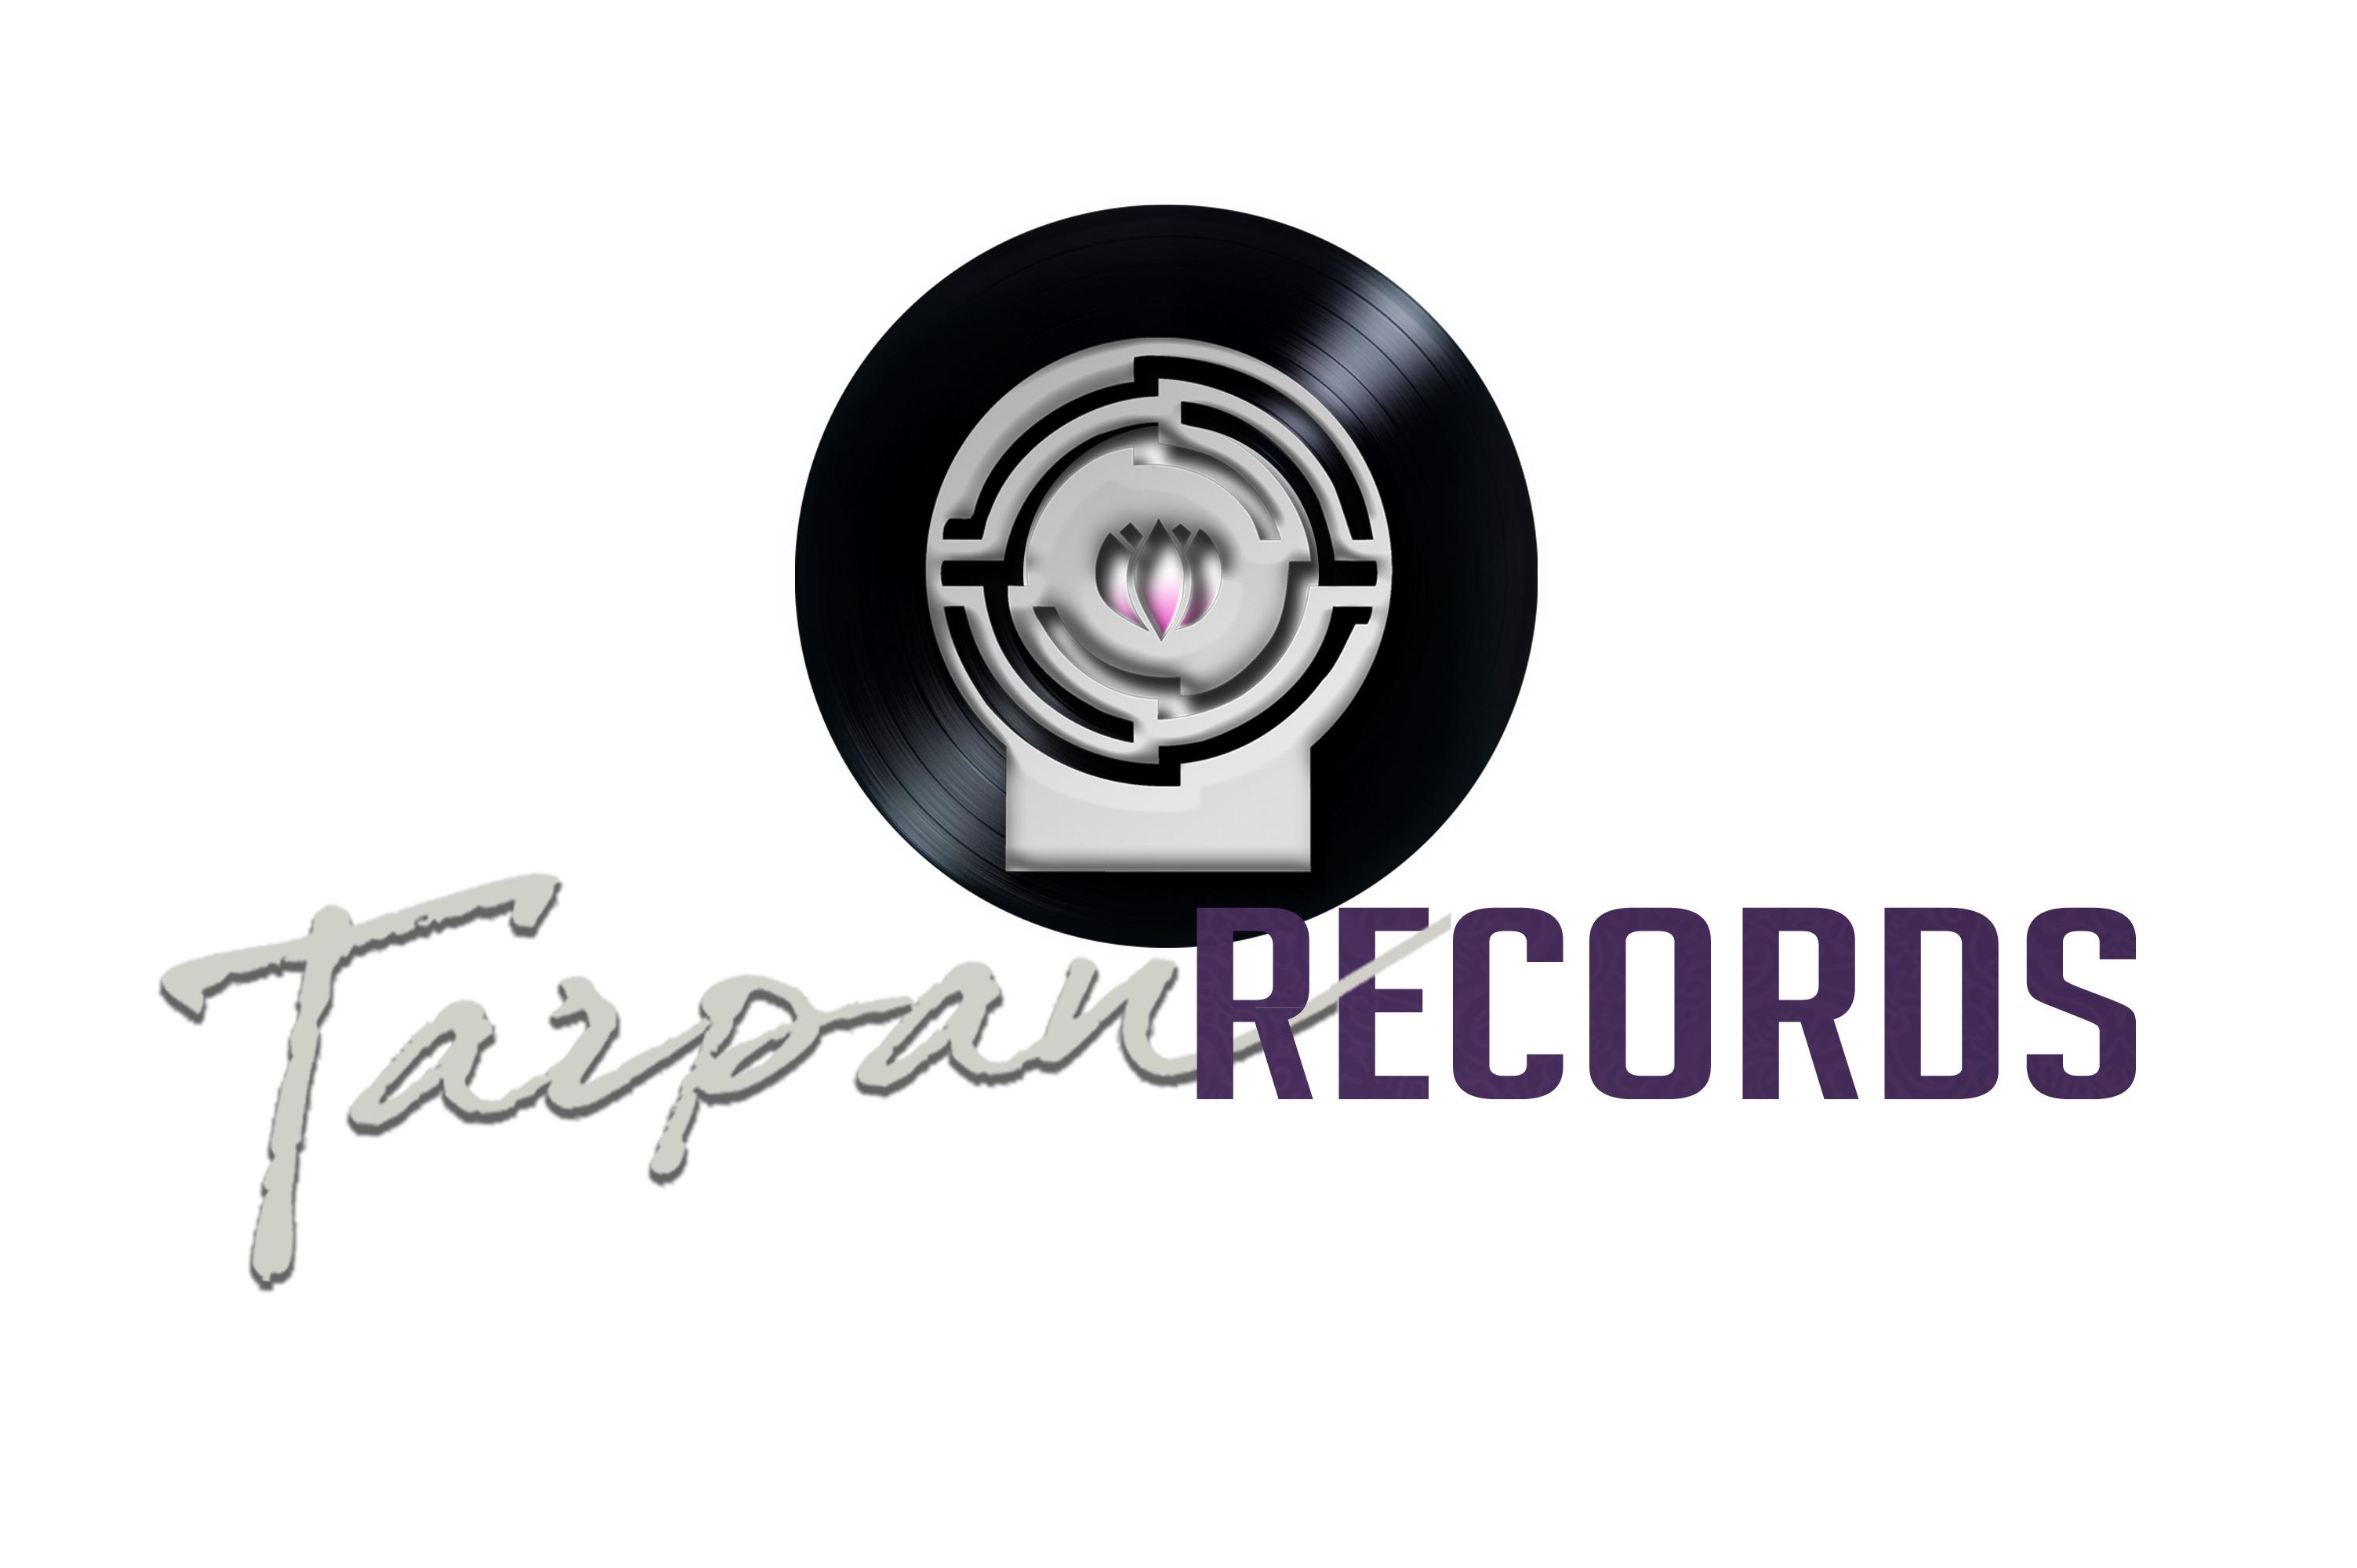 Tarpan Records Logo